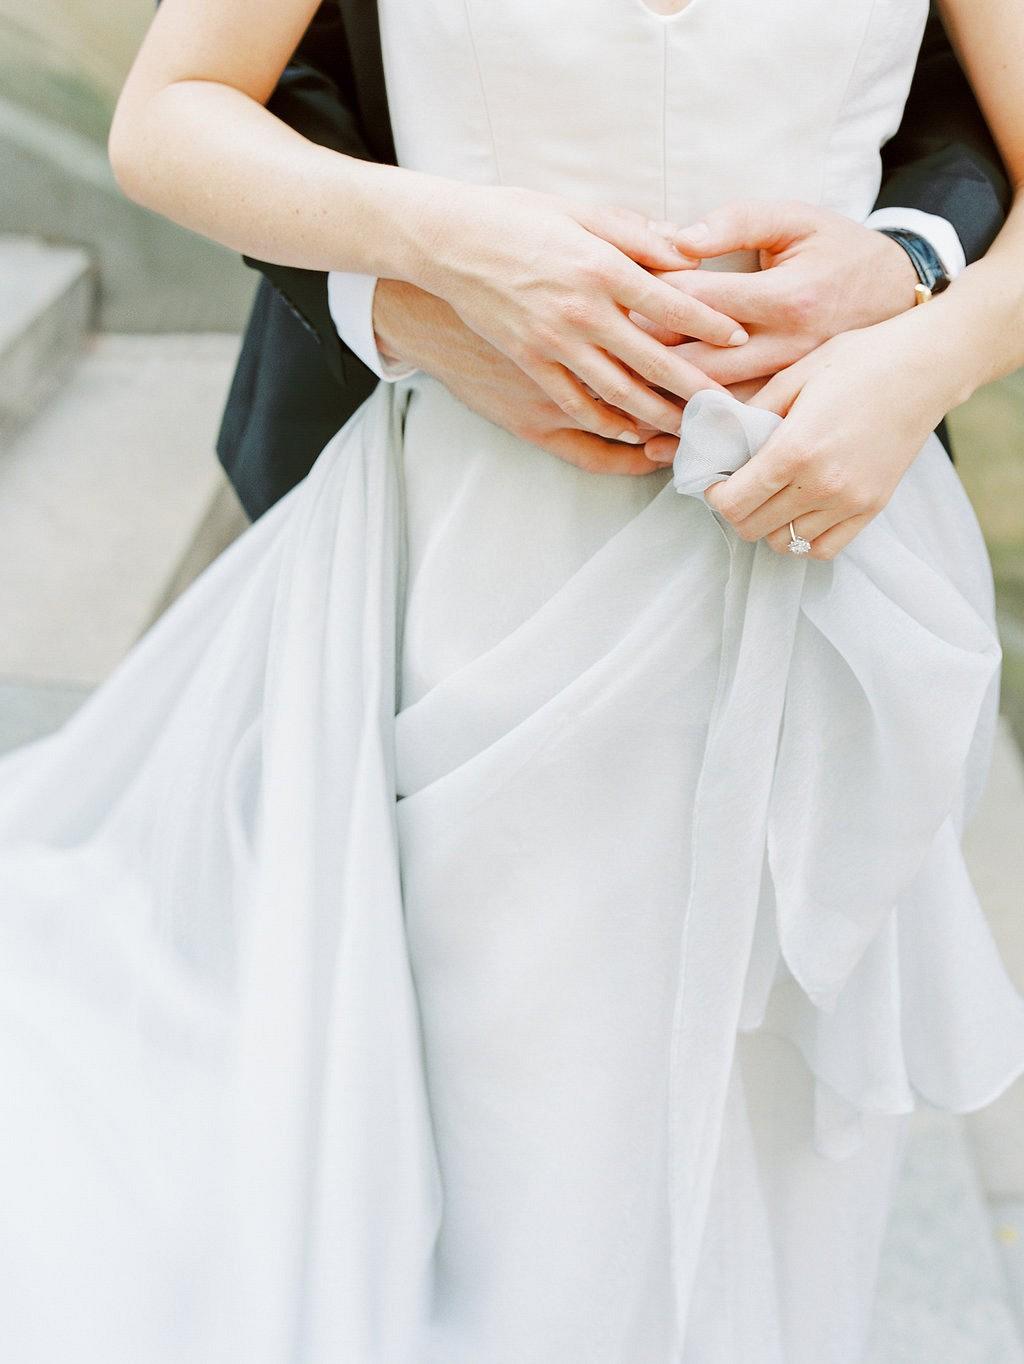 Central Park Elopement in a Pale Blue Wedding Gown